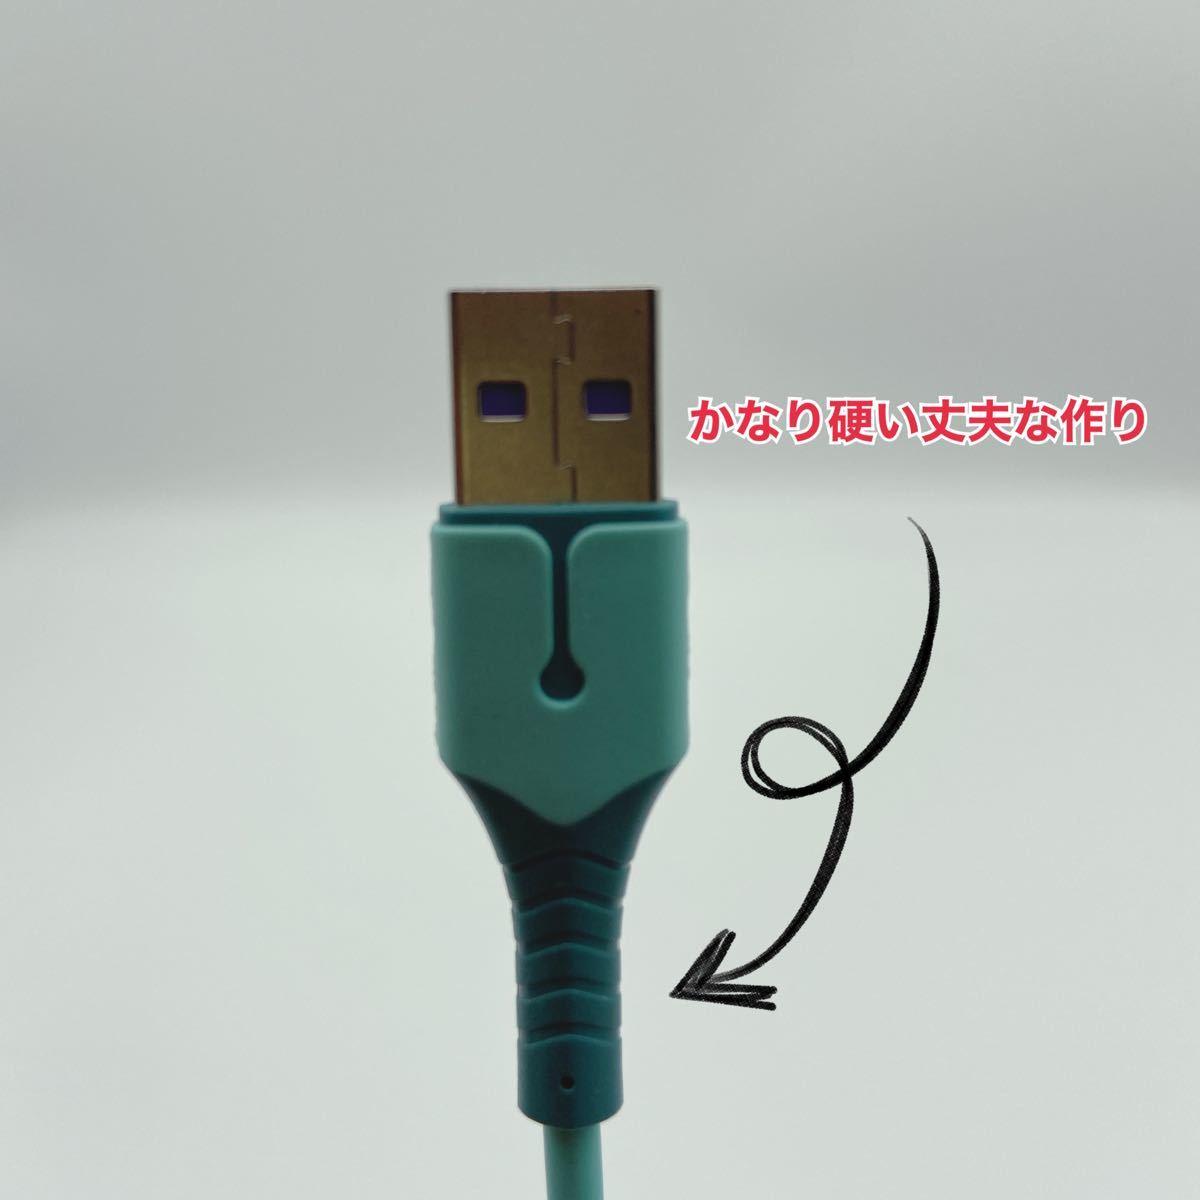 type-c 充電ケーブル 急速充電USB3.0A 2m 4本セット